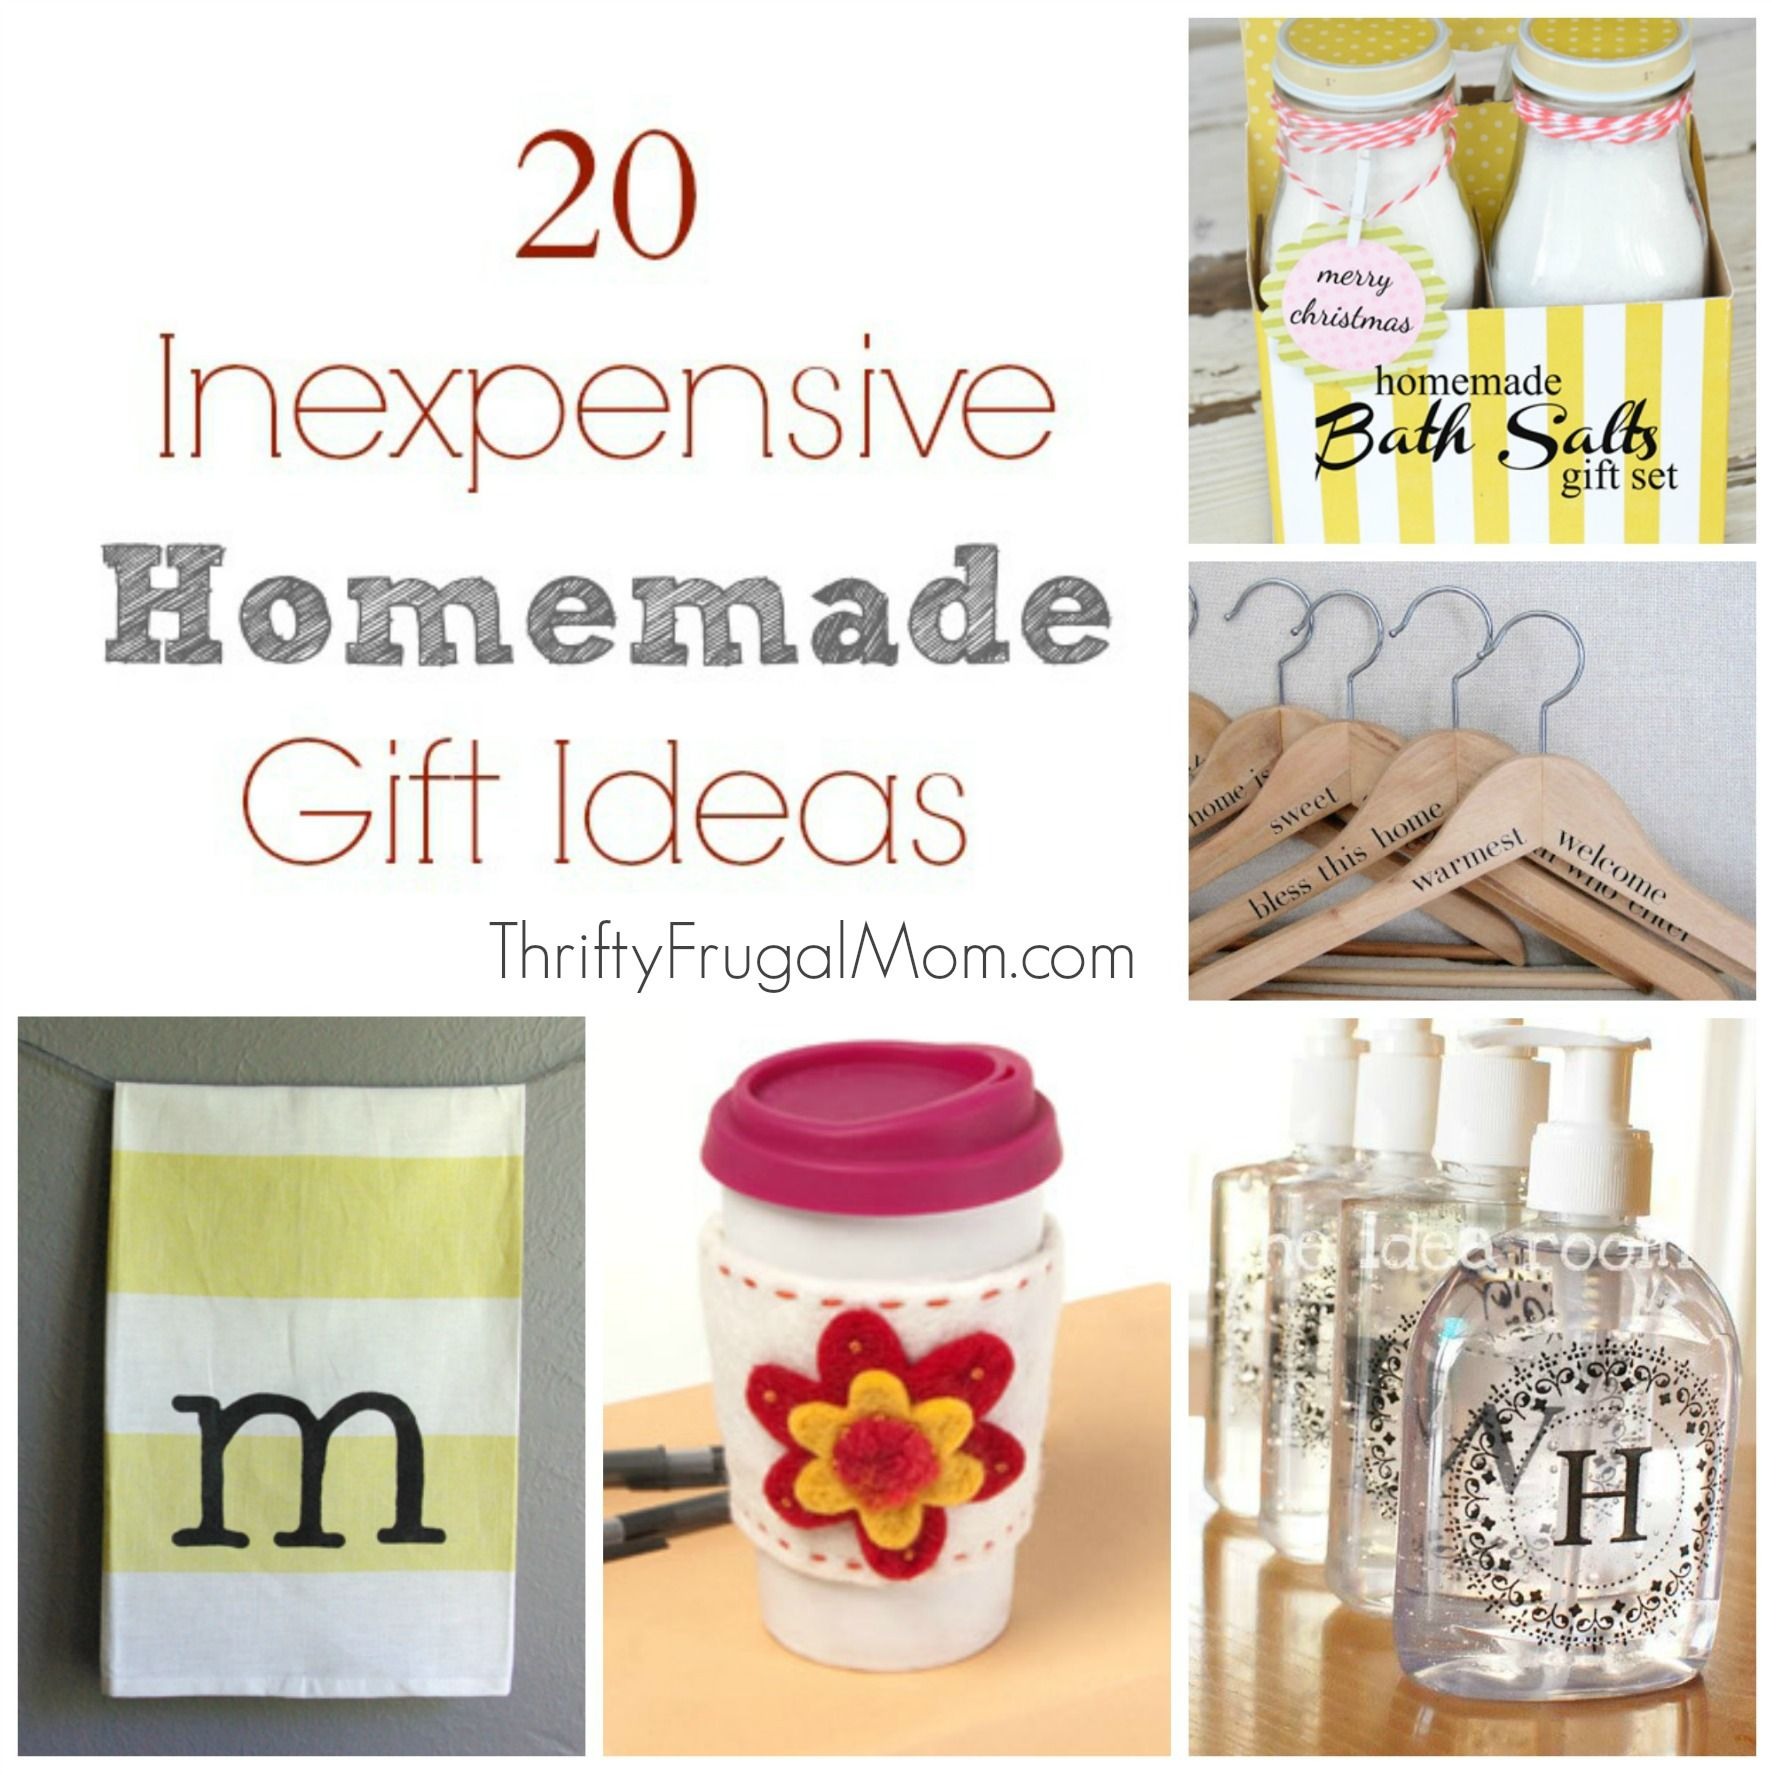 20 inexpensive homemade gift ideas nuevas ideas nuevas y inspiracin 20 inexpensive homemade gift ideas solutioingenieria Choice Image